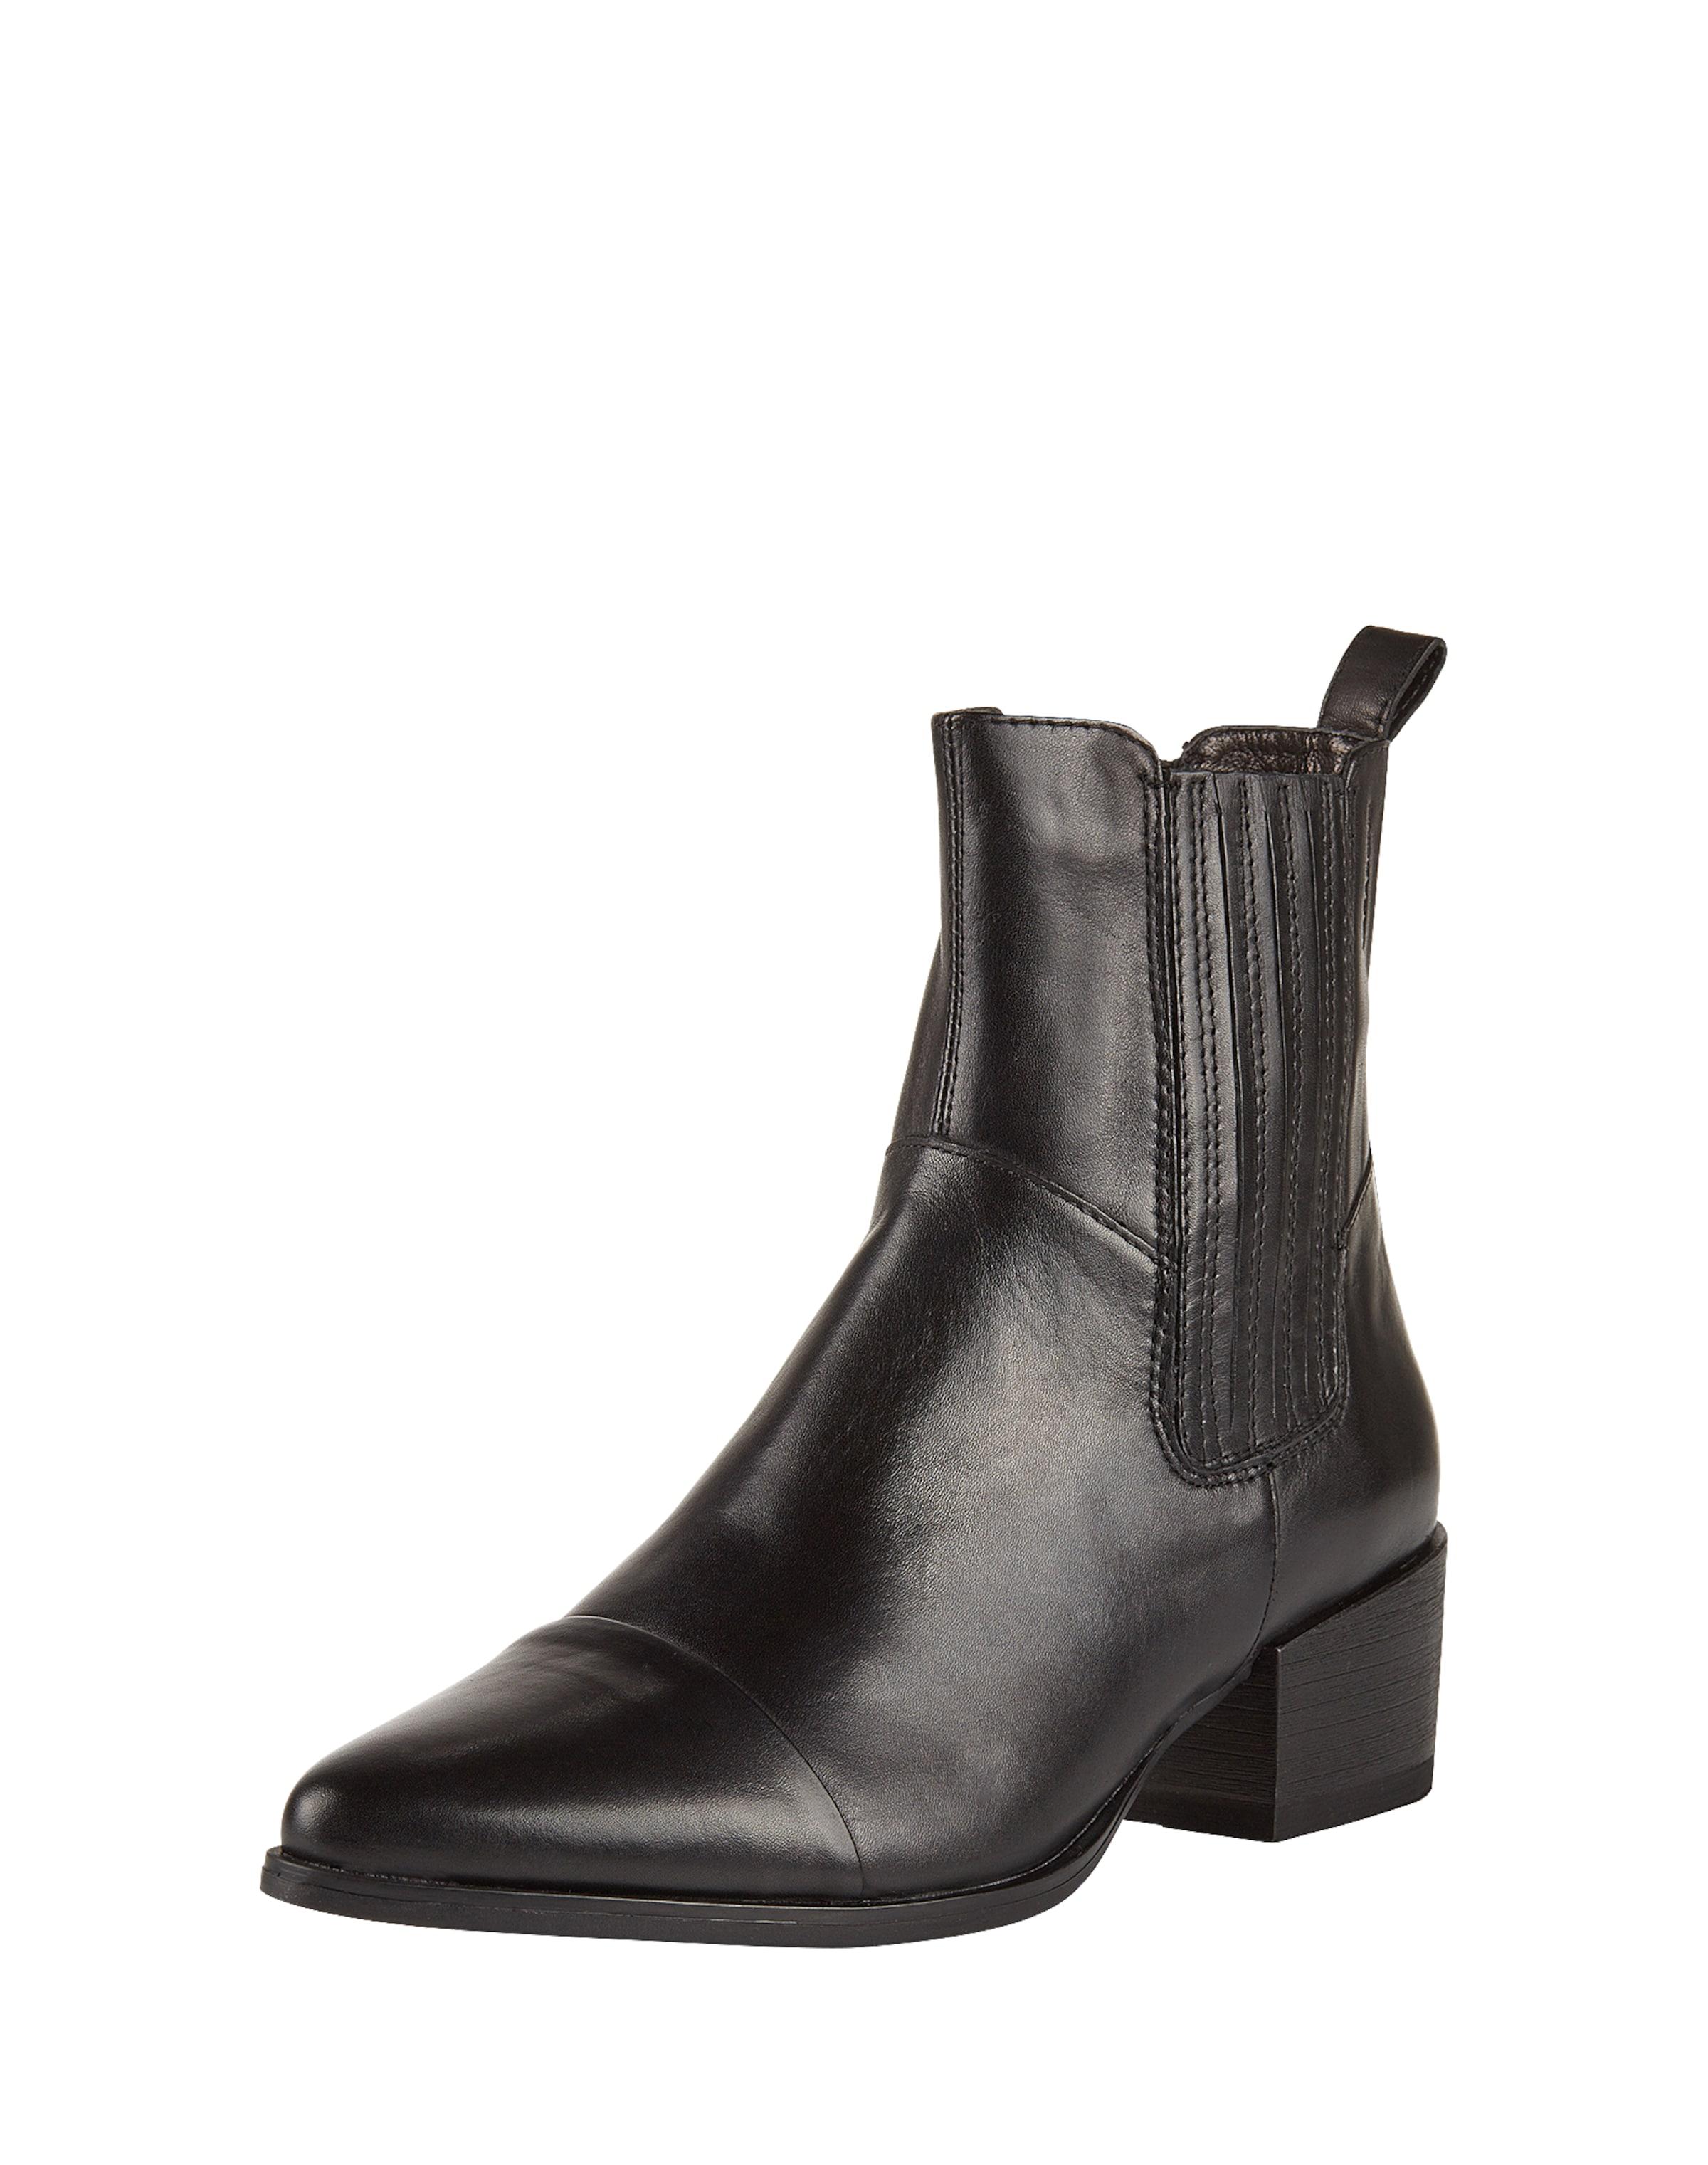 Boots En Noir Chelsea Vagabond Shoemakers HYbIEWeD29